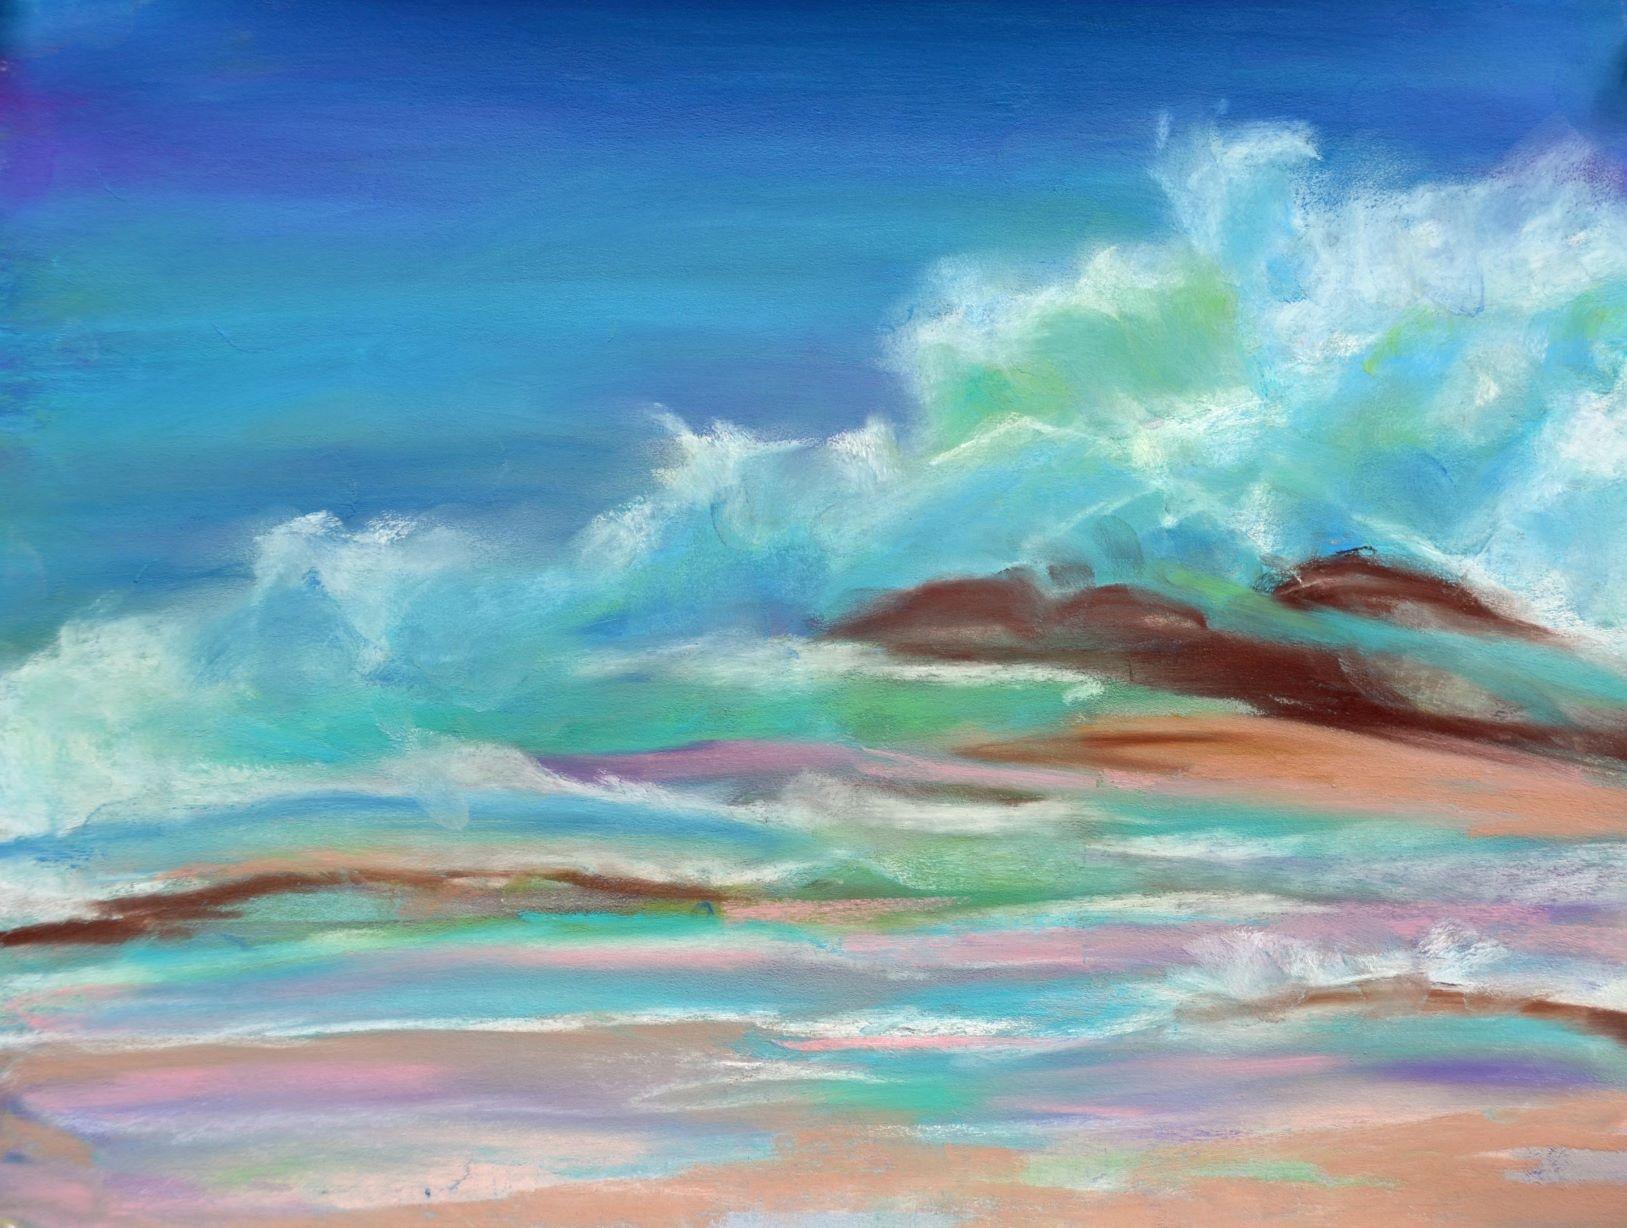 St Maarten surf 1 - pastel 9 x 12 rs